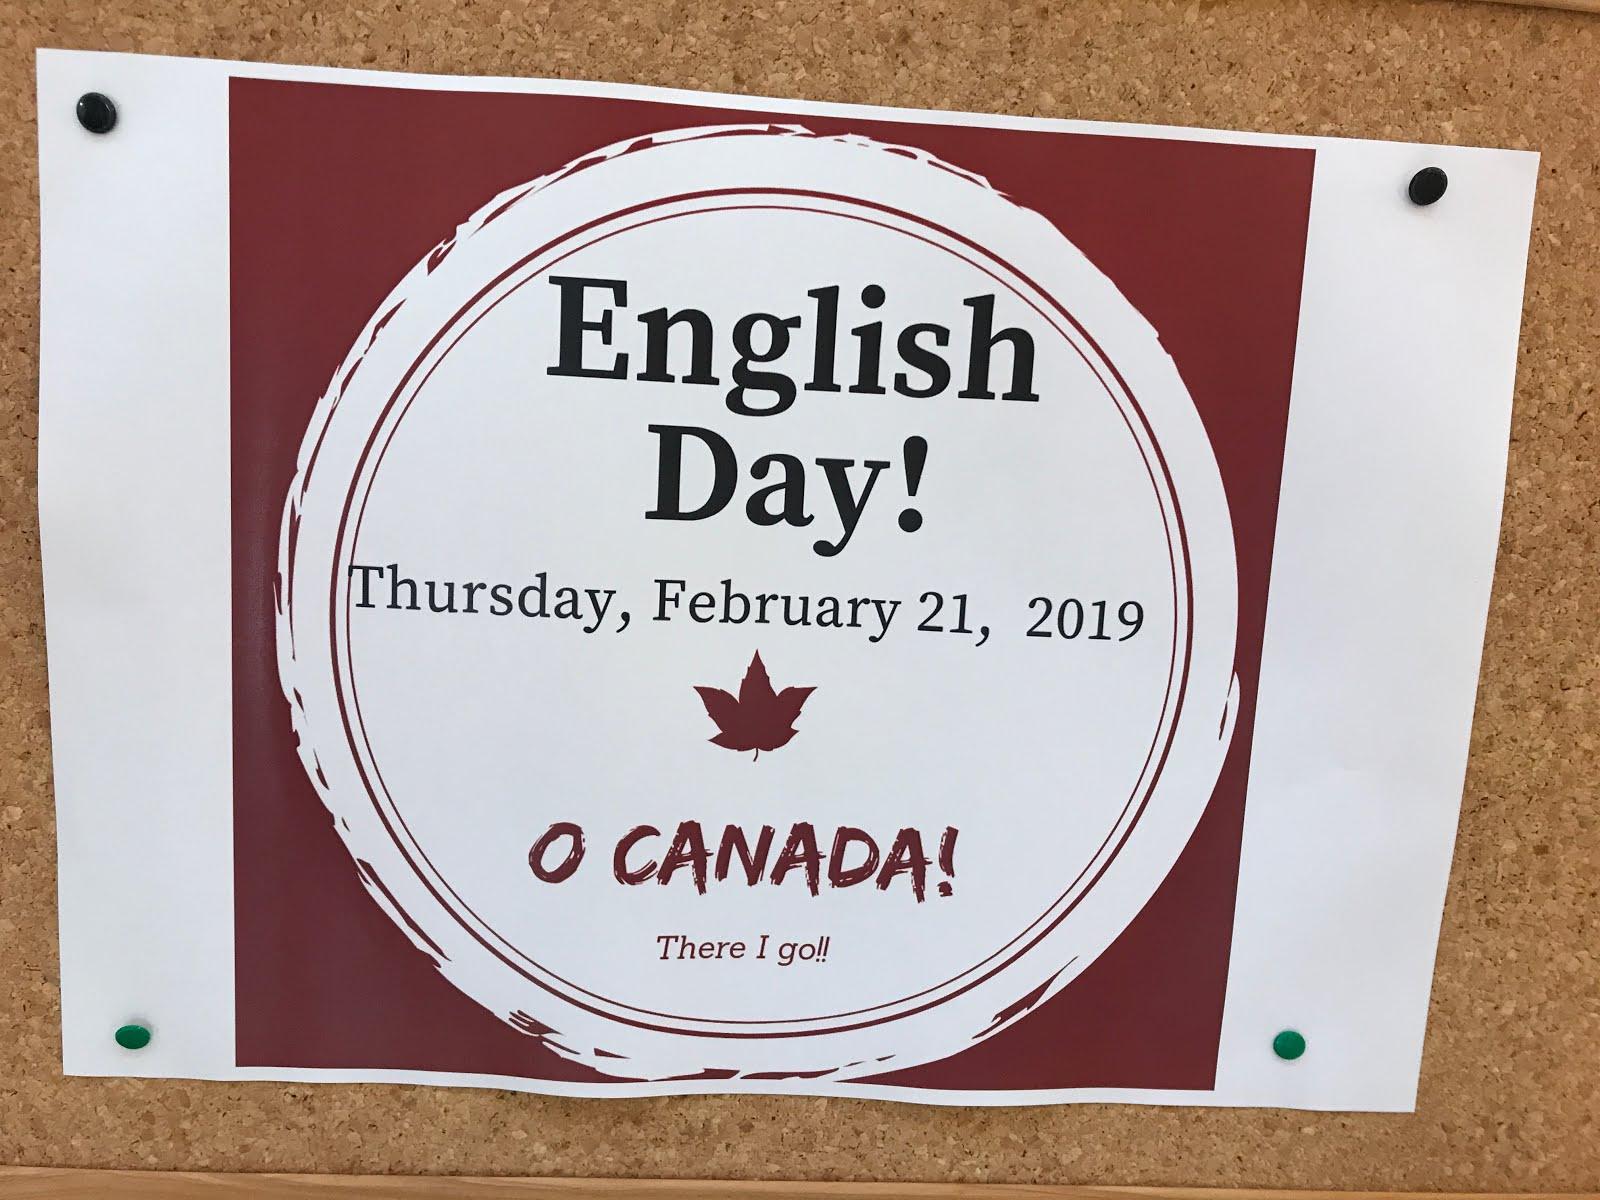 ENGLISH DAY!